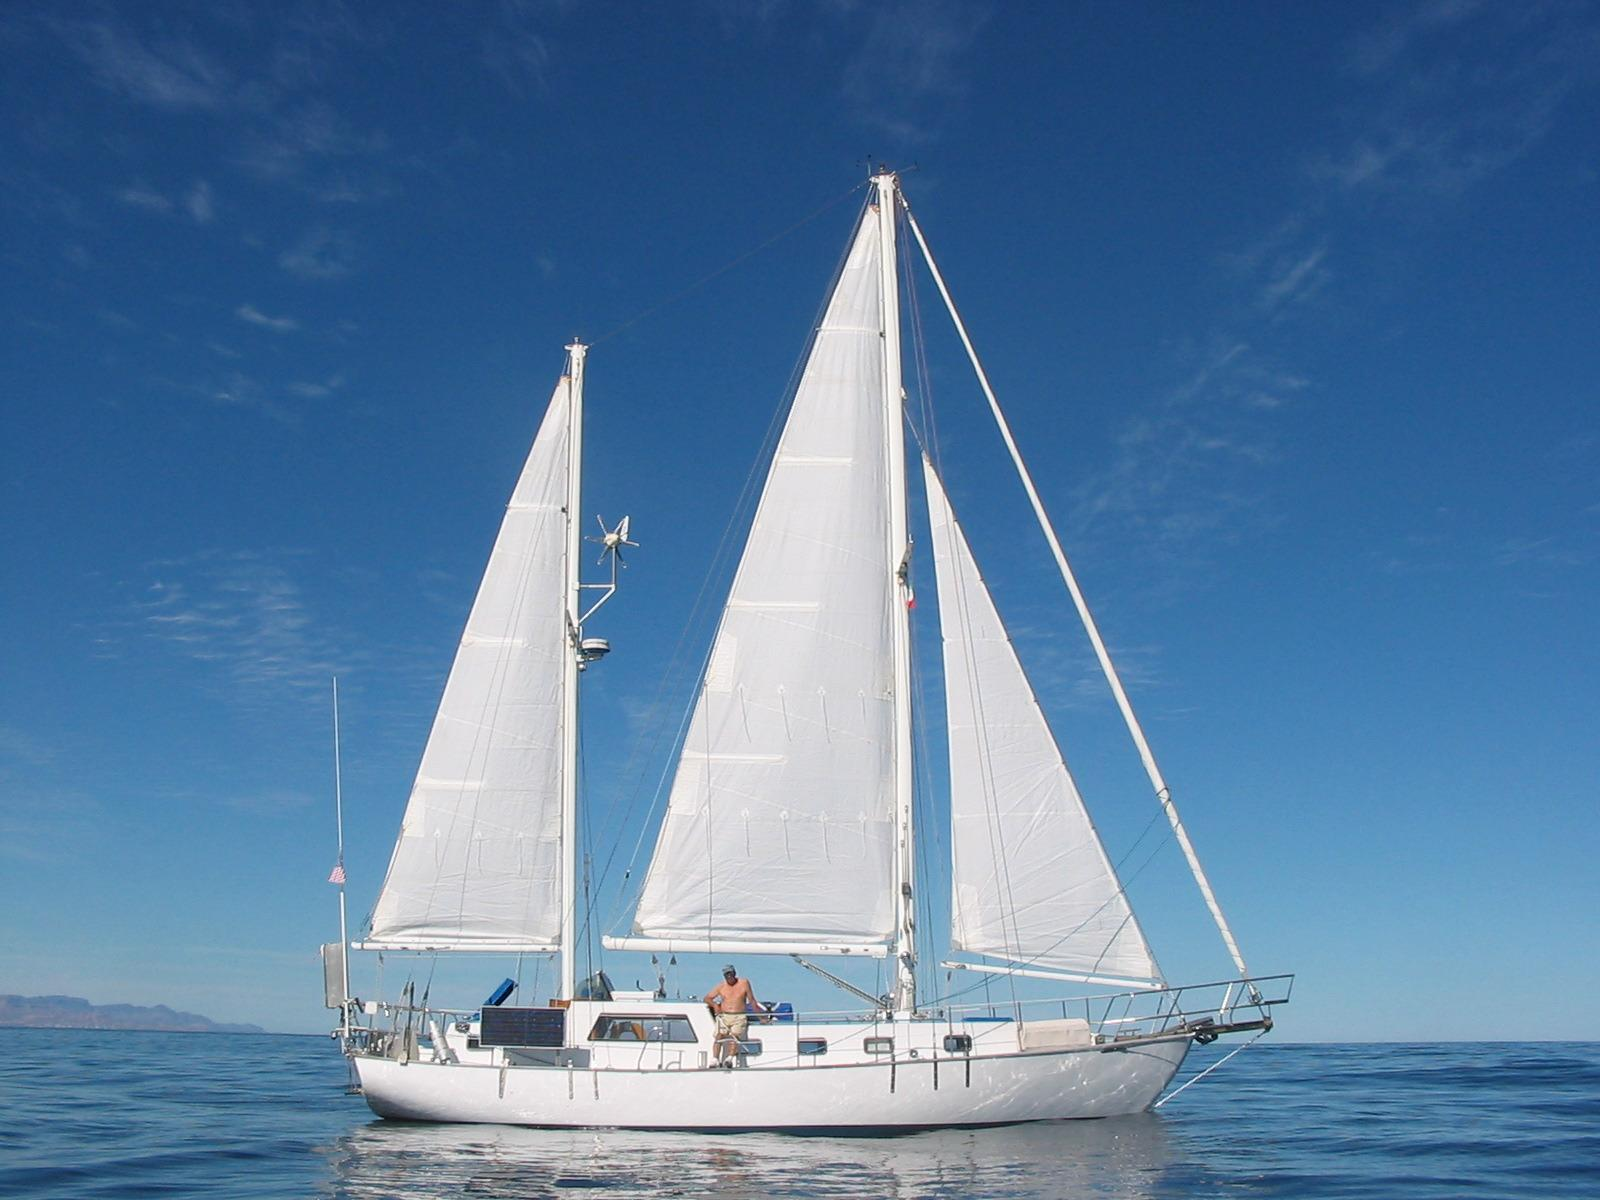 44' Custom C-Smoke Ferrocement Ketch+Boat for sale!